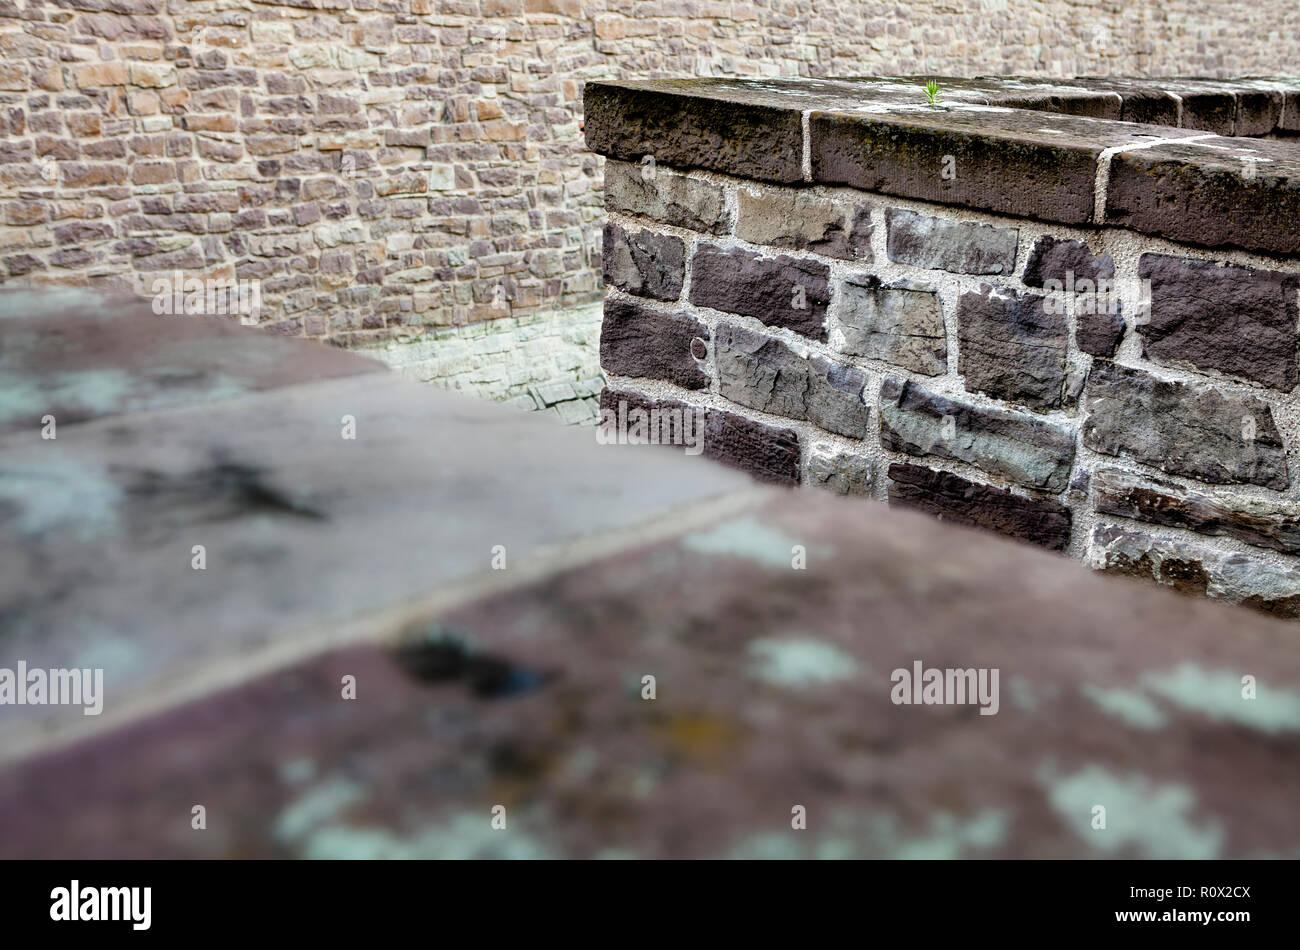 Brick walls, Bad Karlshafen, Upper Weser Valley,  Weser Uplands, Weserbergland, Hesse, Germany, Europe - Stock Image